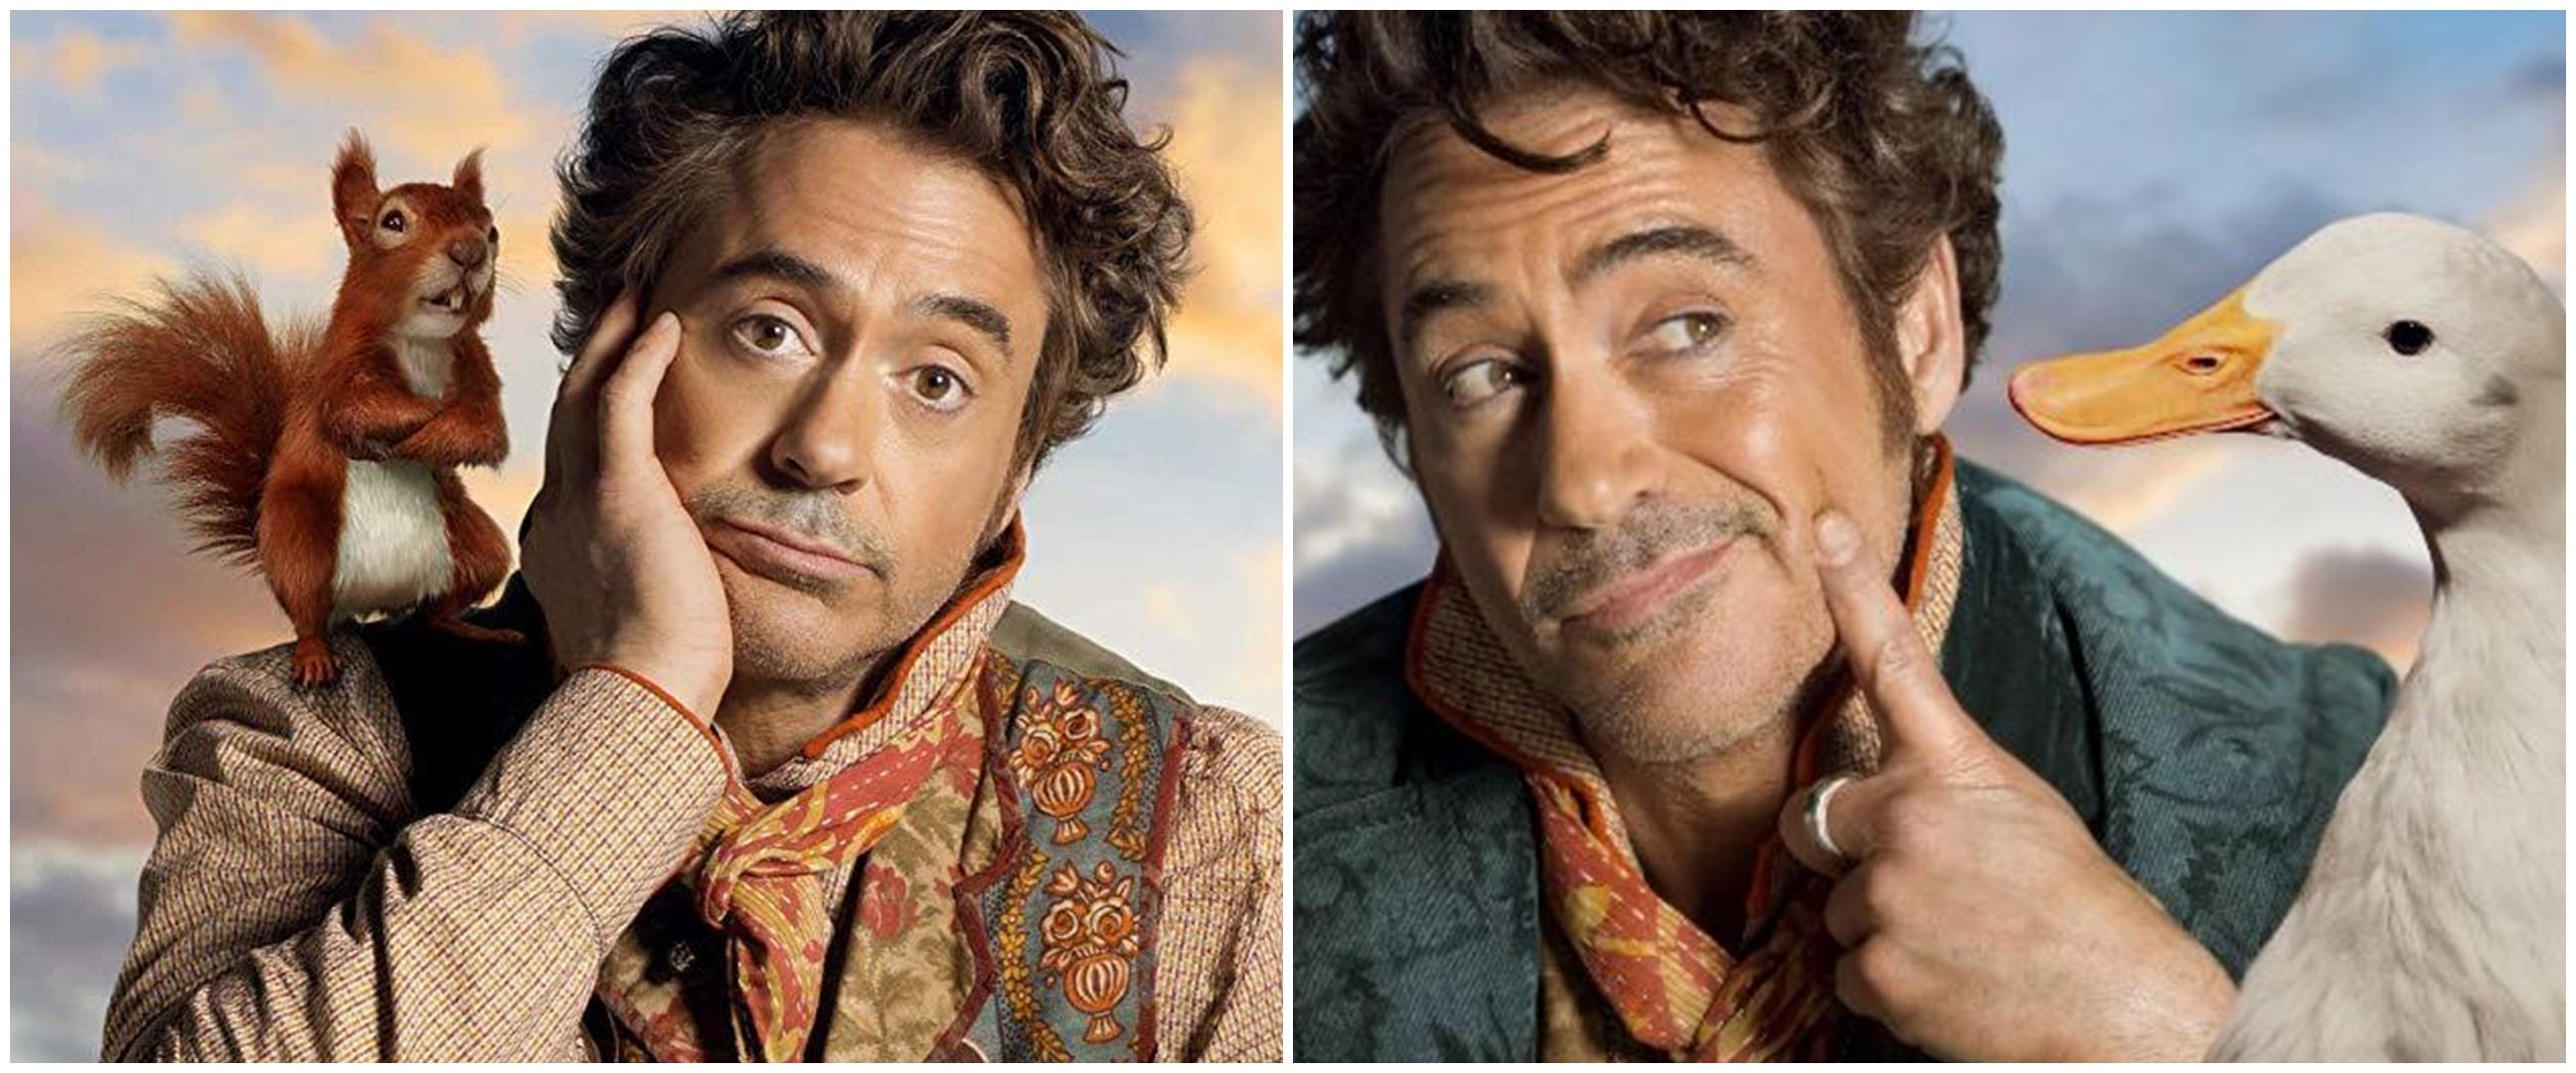 6 Fakta film Dolittle, ajang reuni Robert Downey Jr & Tom Holland